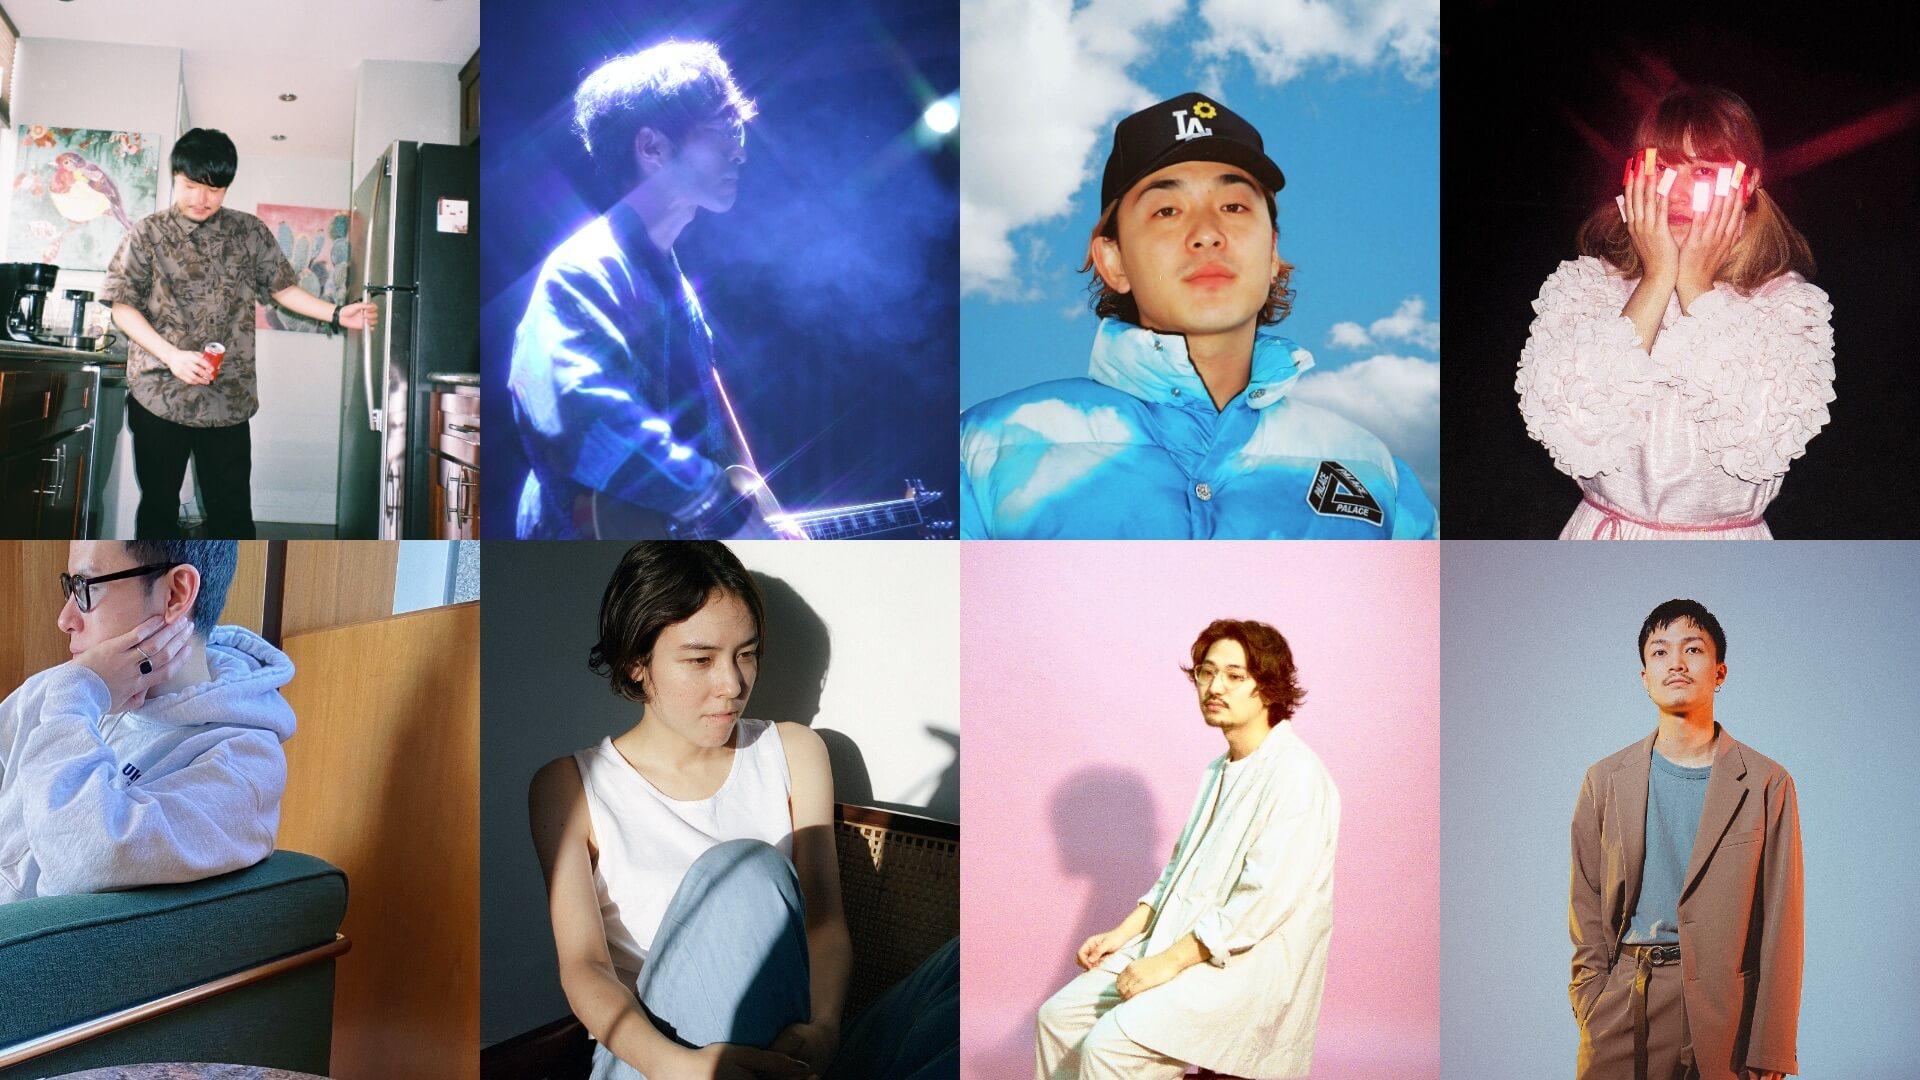 maco maretsが5thアルバム『WSIV:Lost in November』をリリース決定!週末CITY PLAY BOYZ・BUGS、さとうもか、Shin Sakiuraらが参加 473010584c8a5f0163353dee47d2ce22